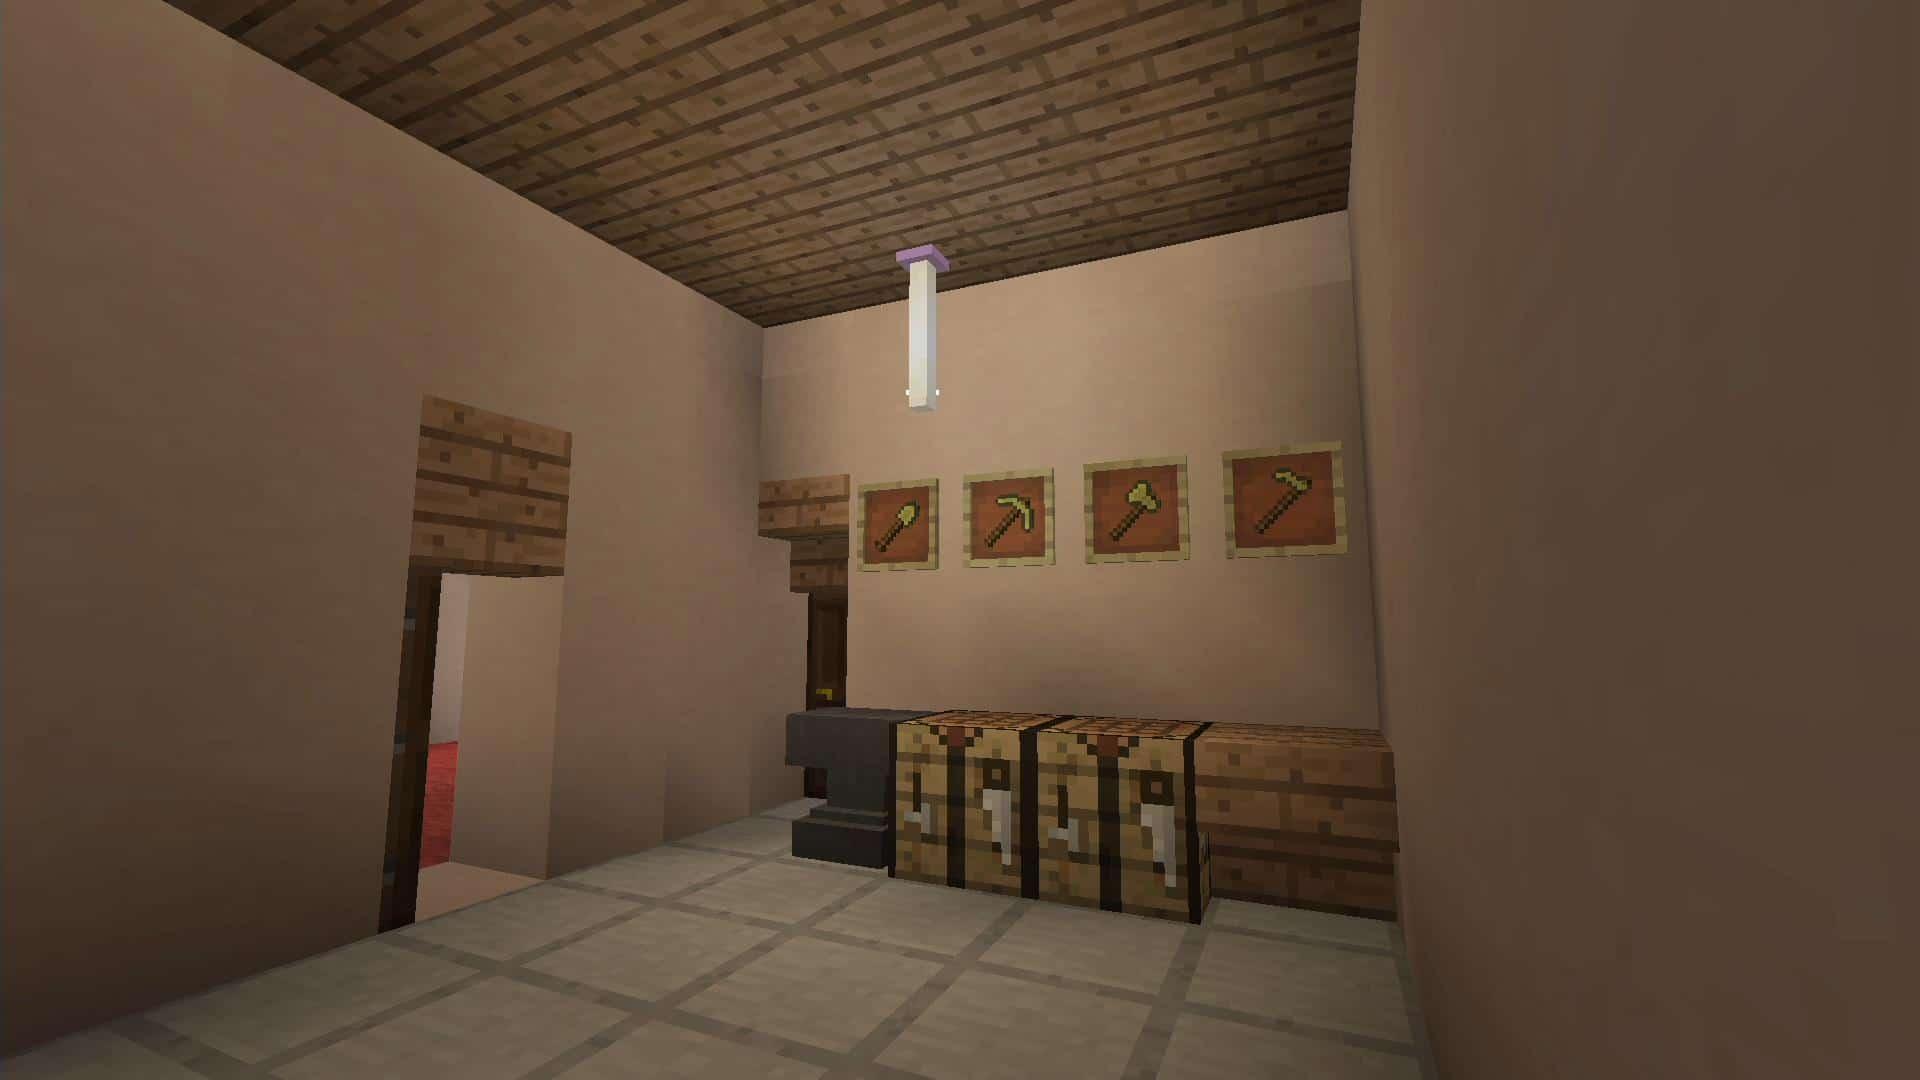 Minecraft How To Make Row Houses Xbox One Minecraft